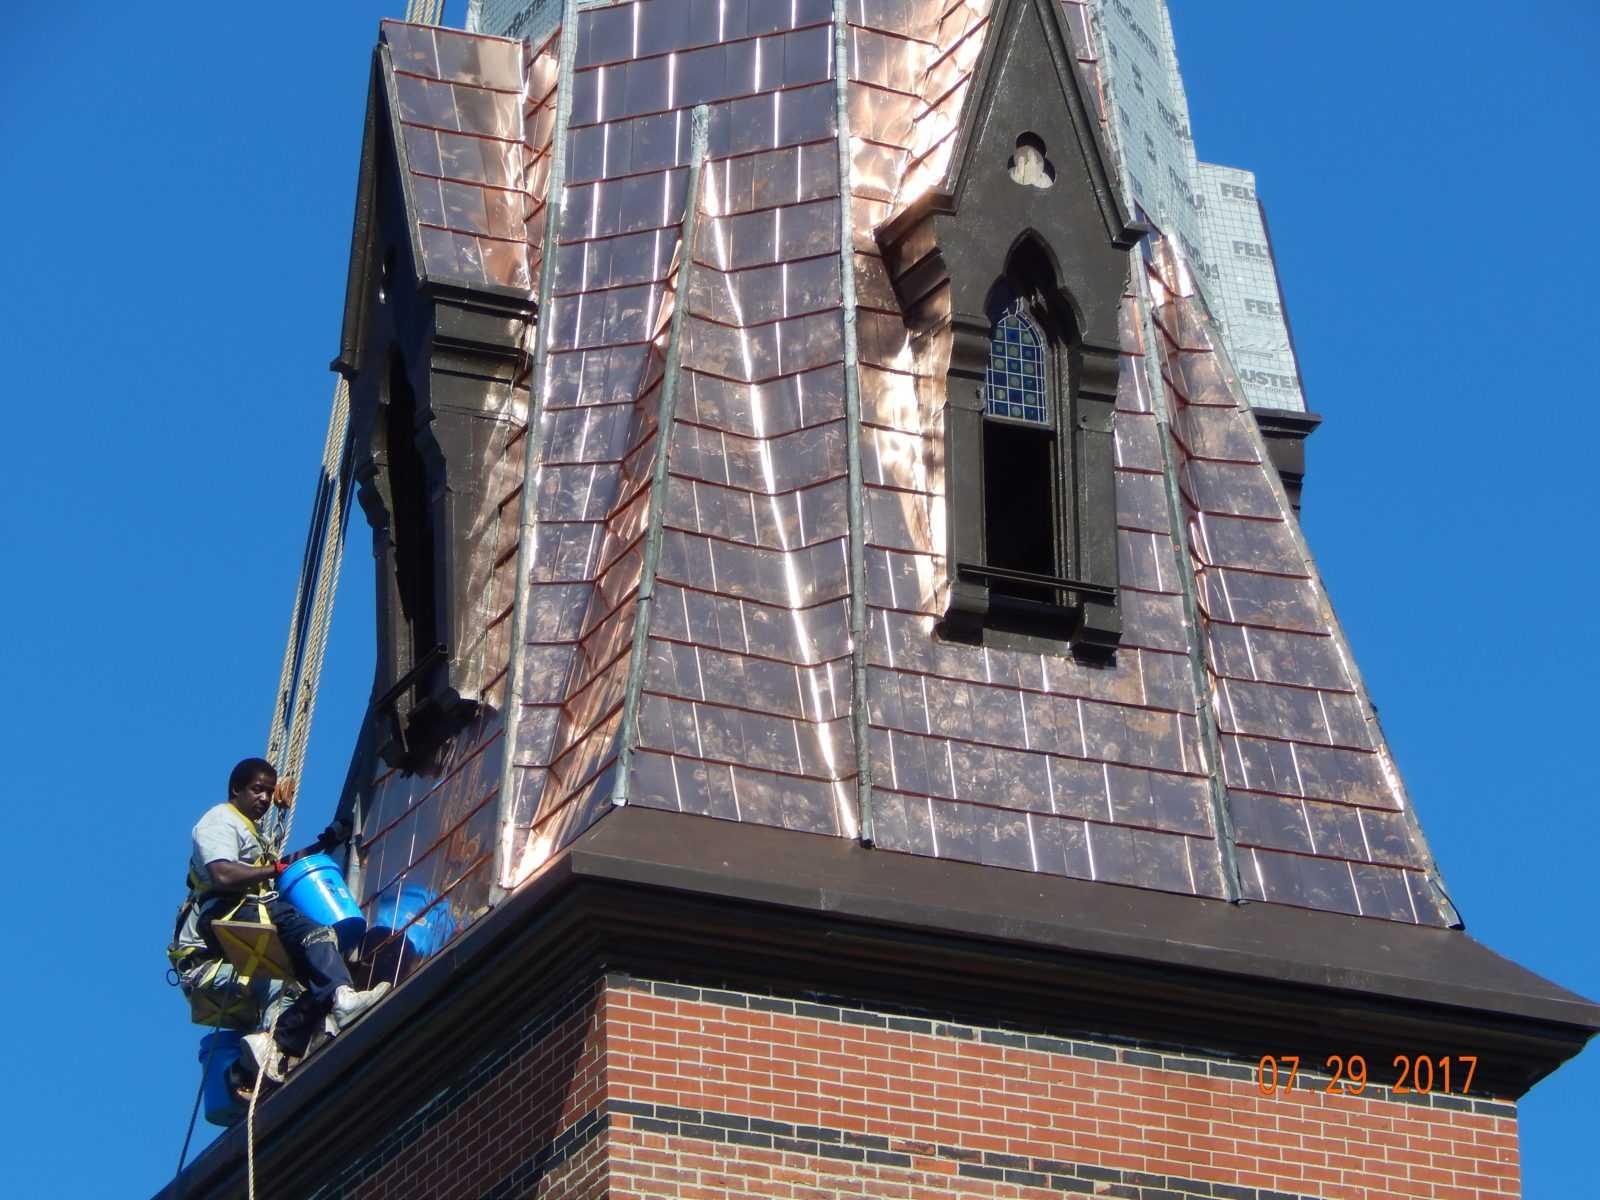 Church Steeple Roofer